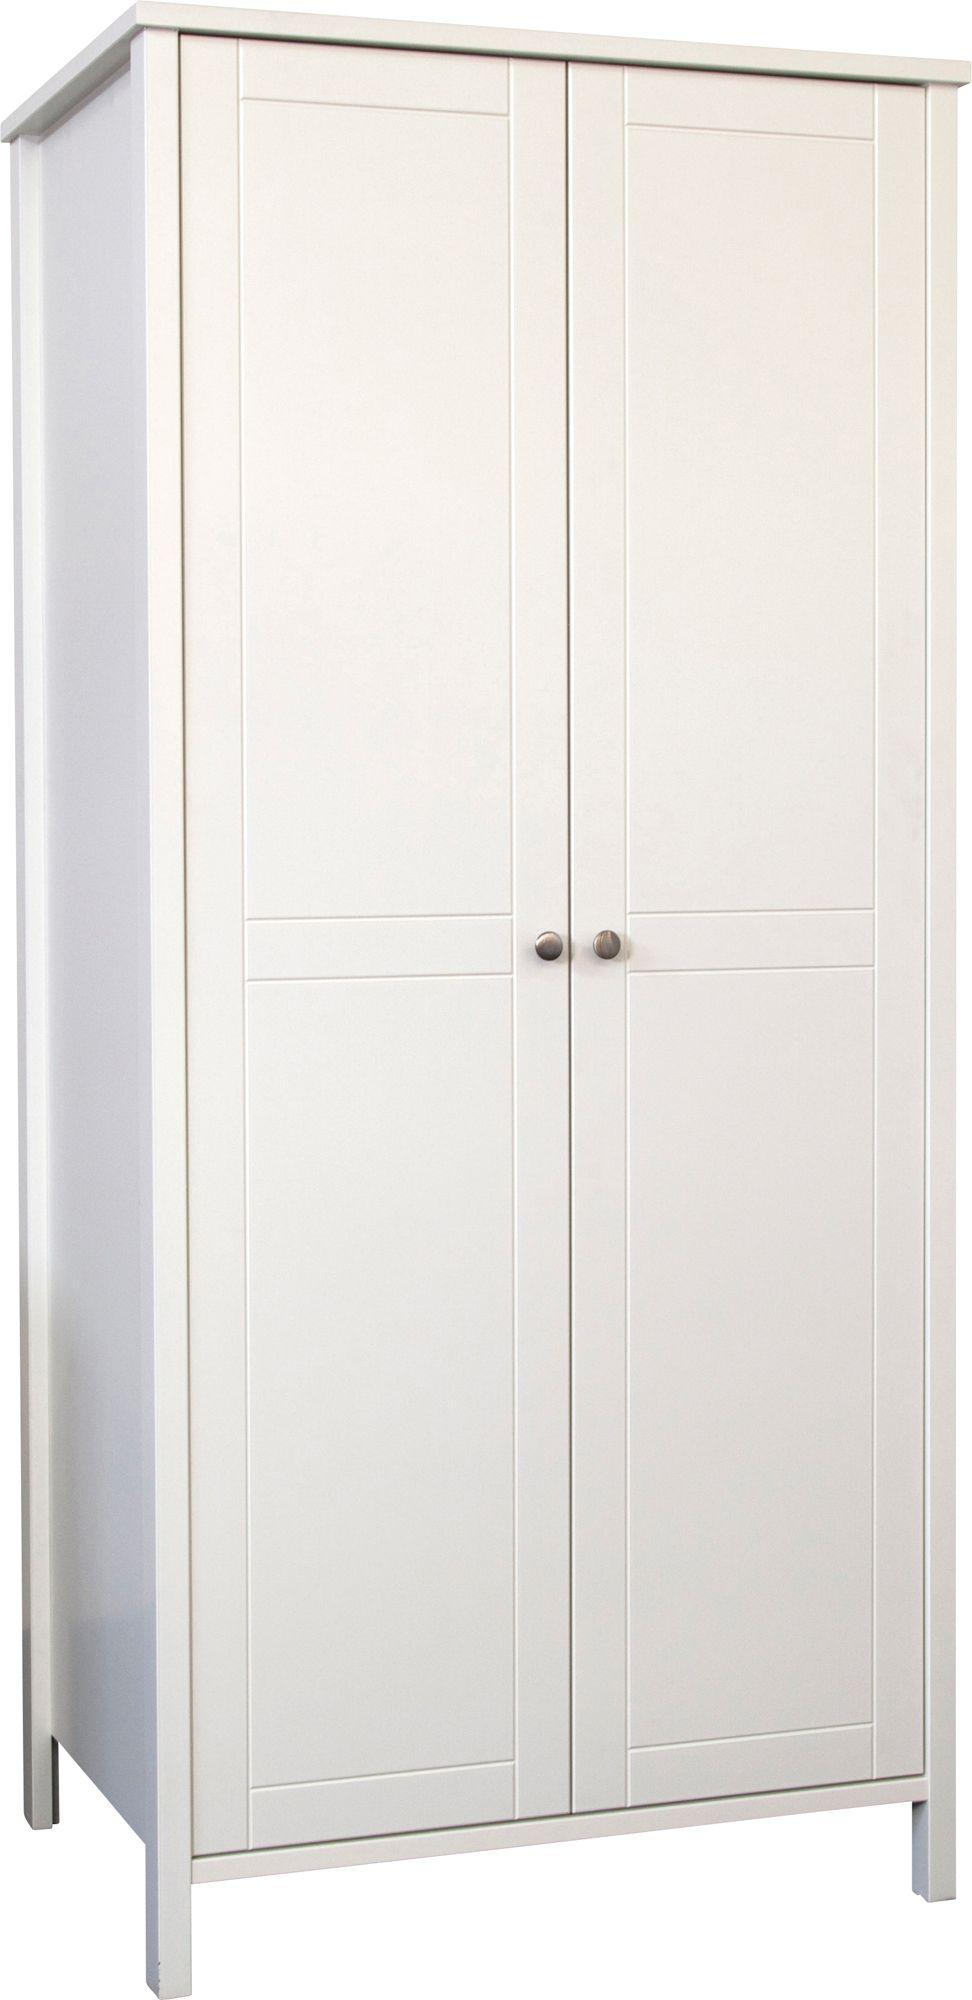 Bergen white wardrobe h 1950mm w 900mm departments for Bergen garage door